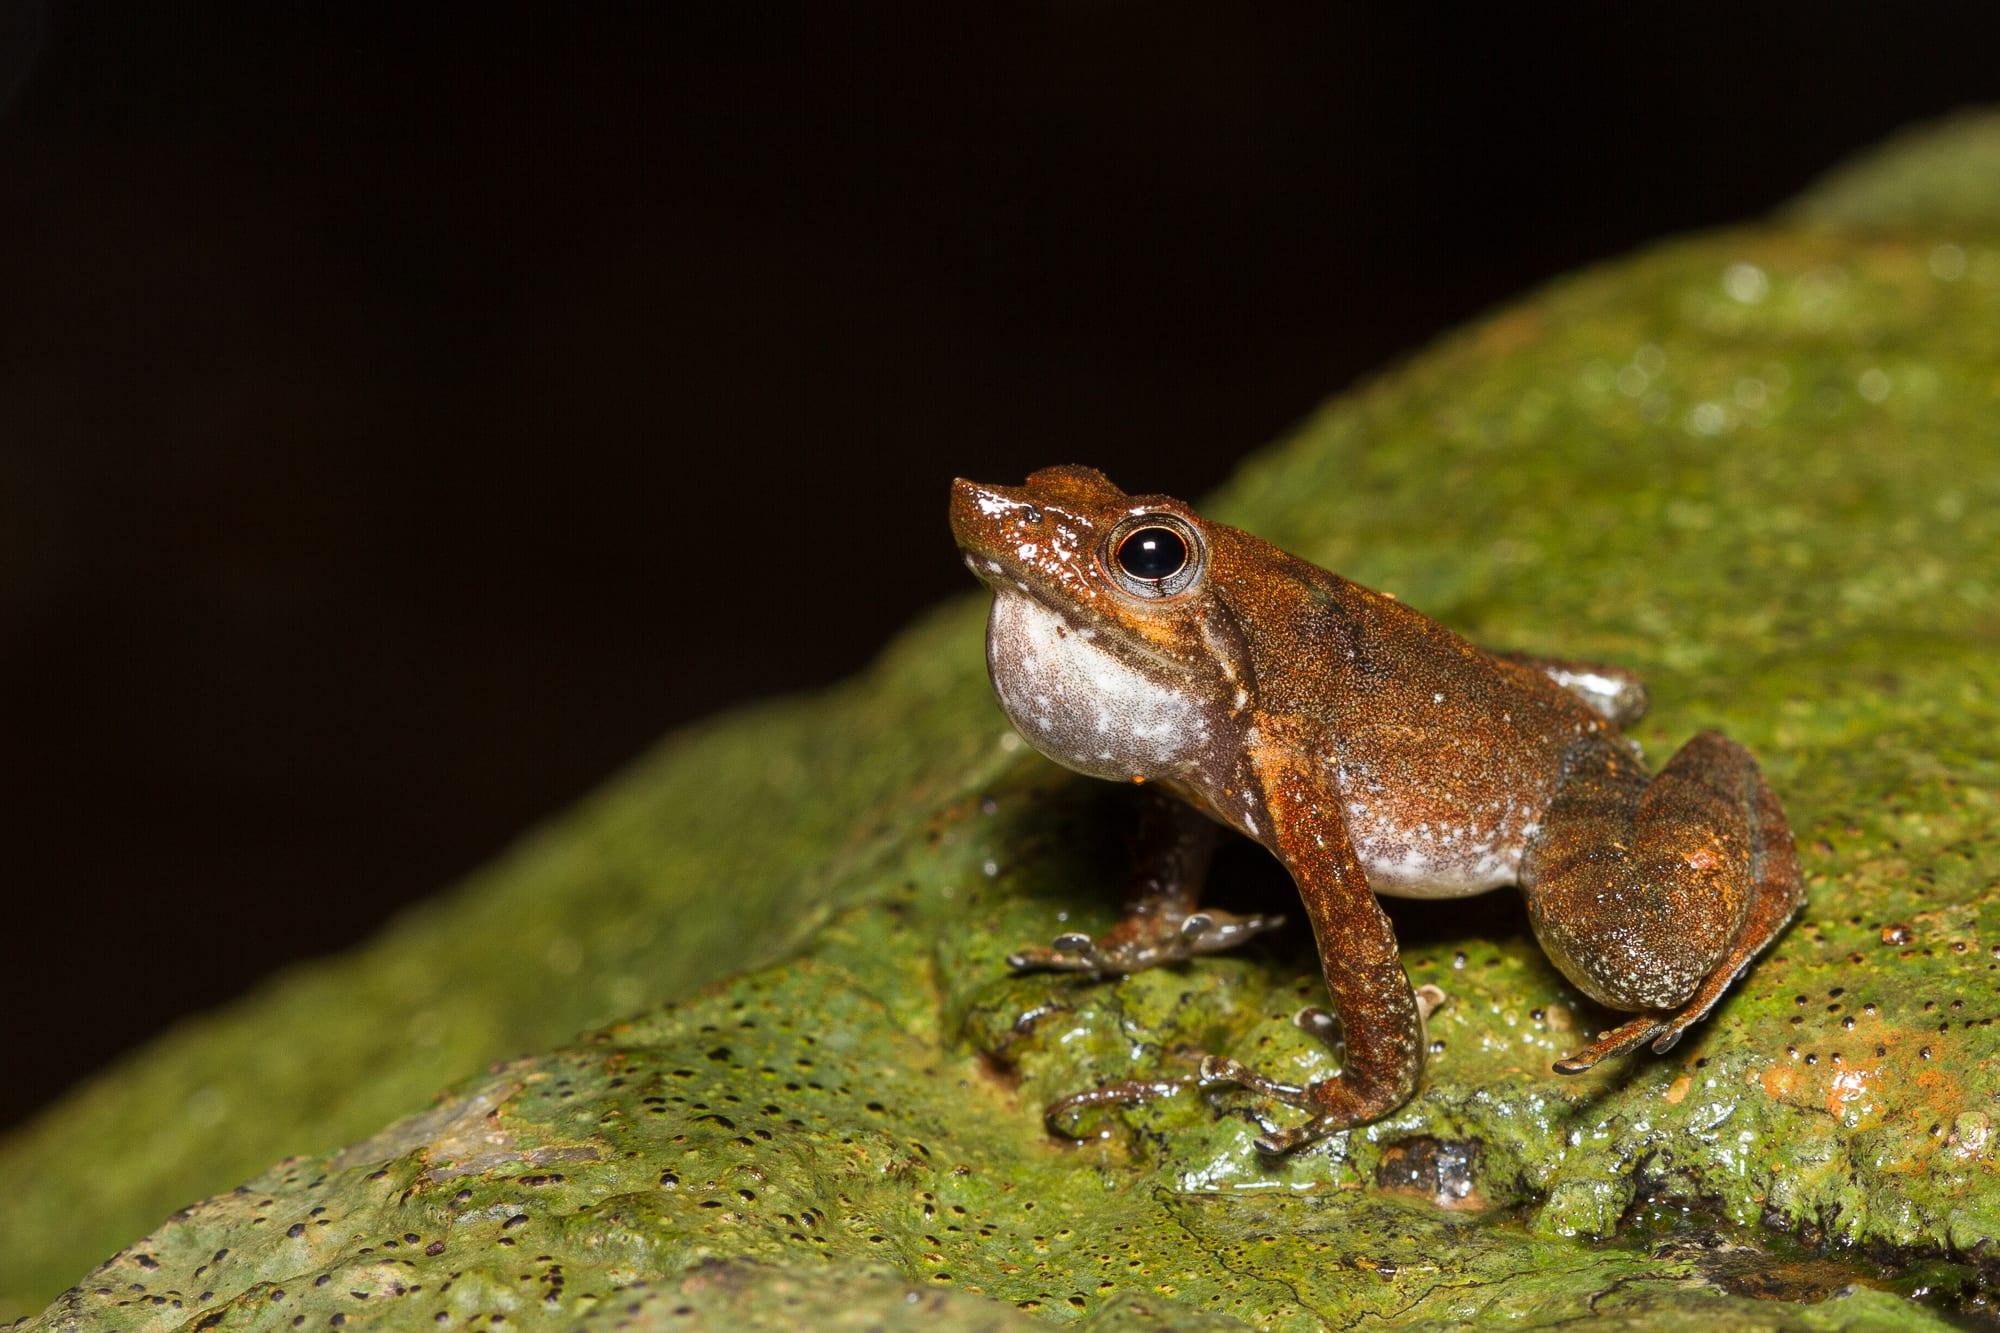 Shaking a Leg with the Kottigehar Dancing Frog